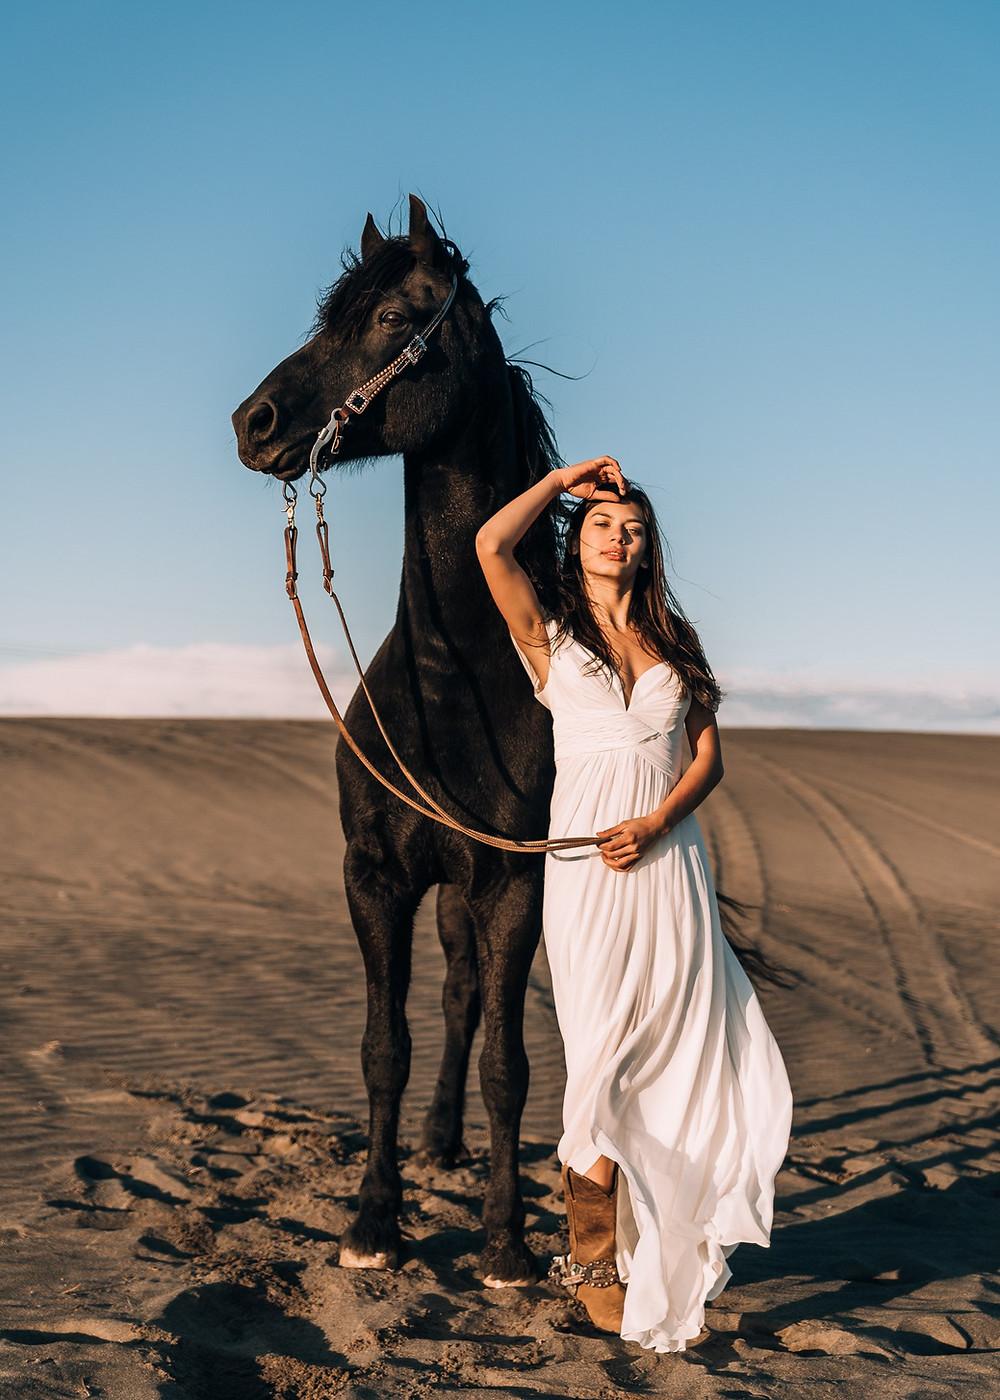 Soli wearing a white dress, standing next to Samson